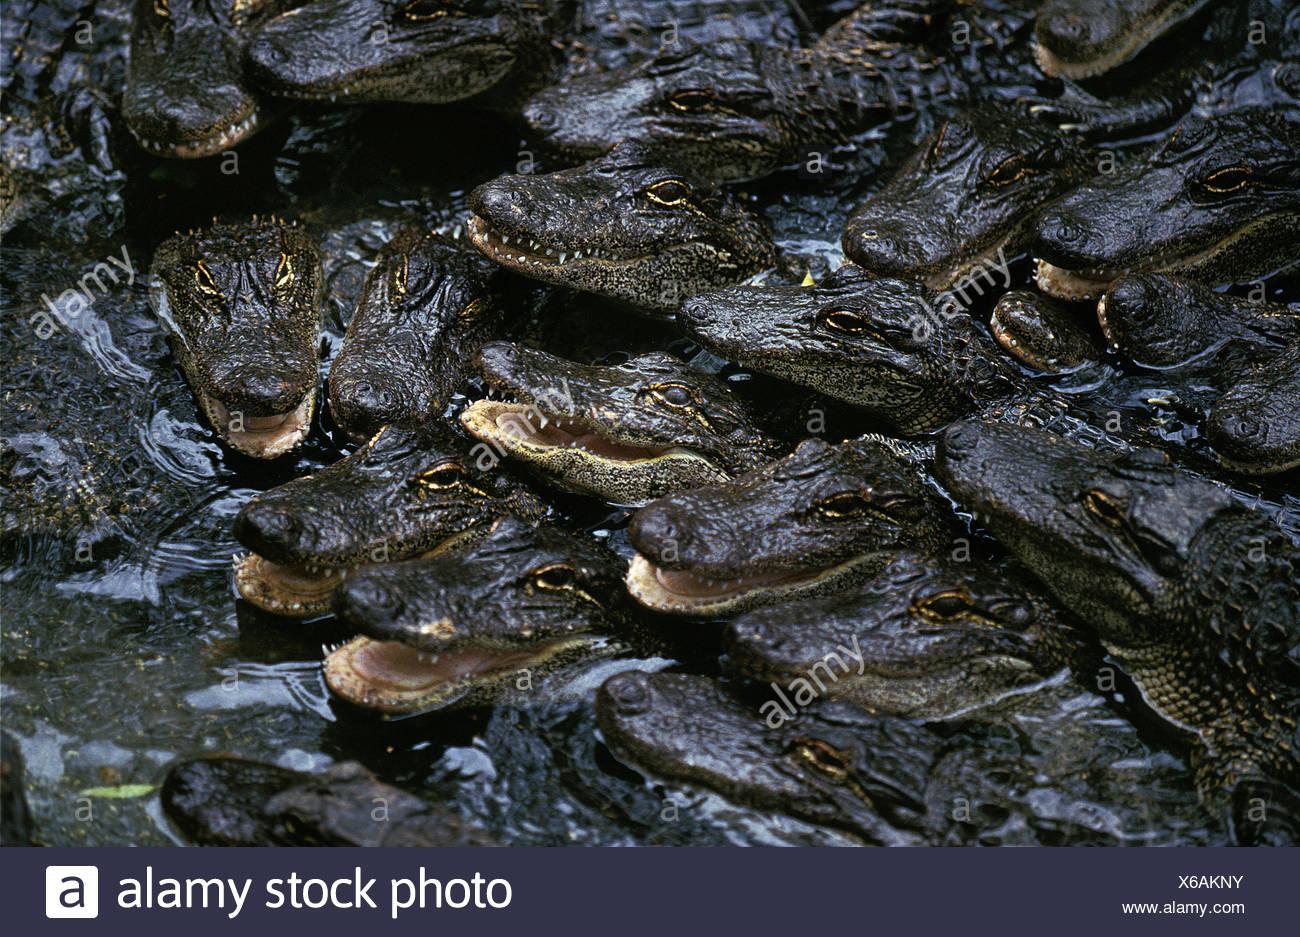 American Alligator, alligator mississipiensis, Babies in Crocodile Farm - Stock Image